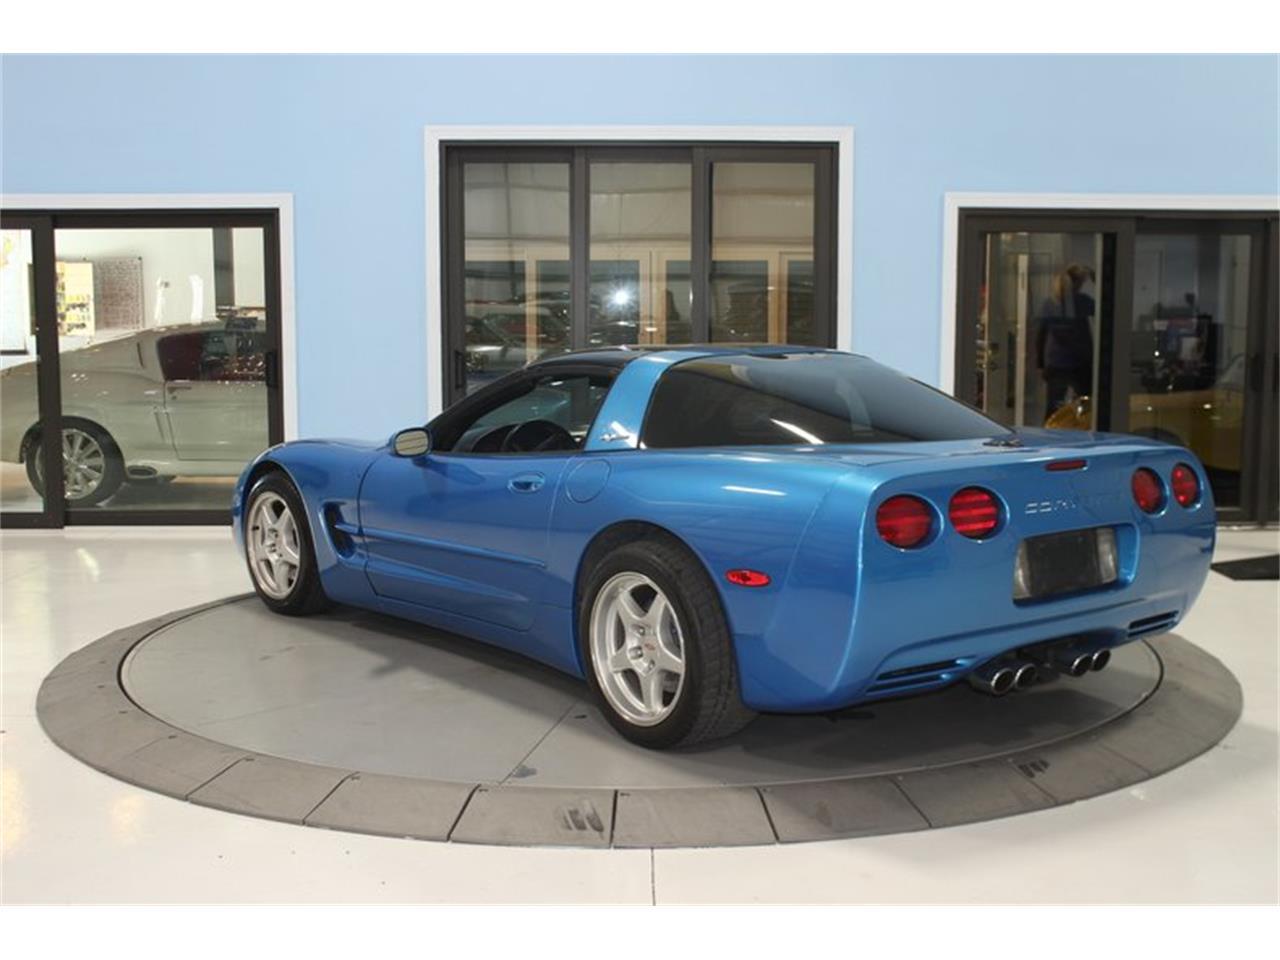 Large Picture of '97 Chevrolet Corvette - $10,497.00 - PSRK